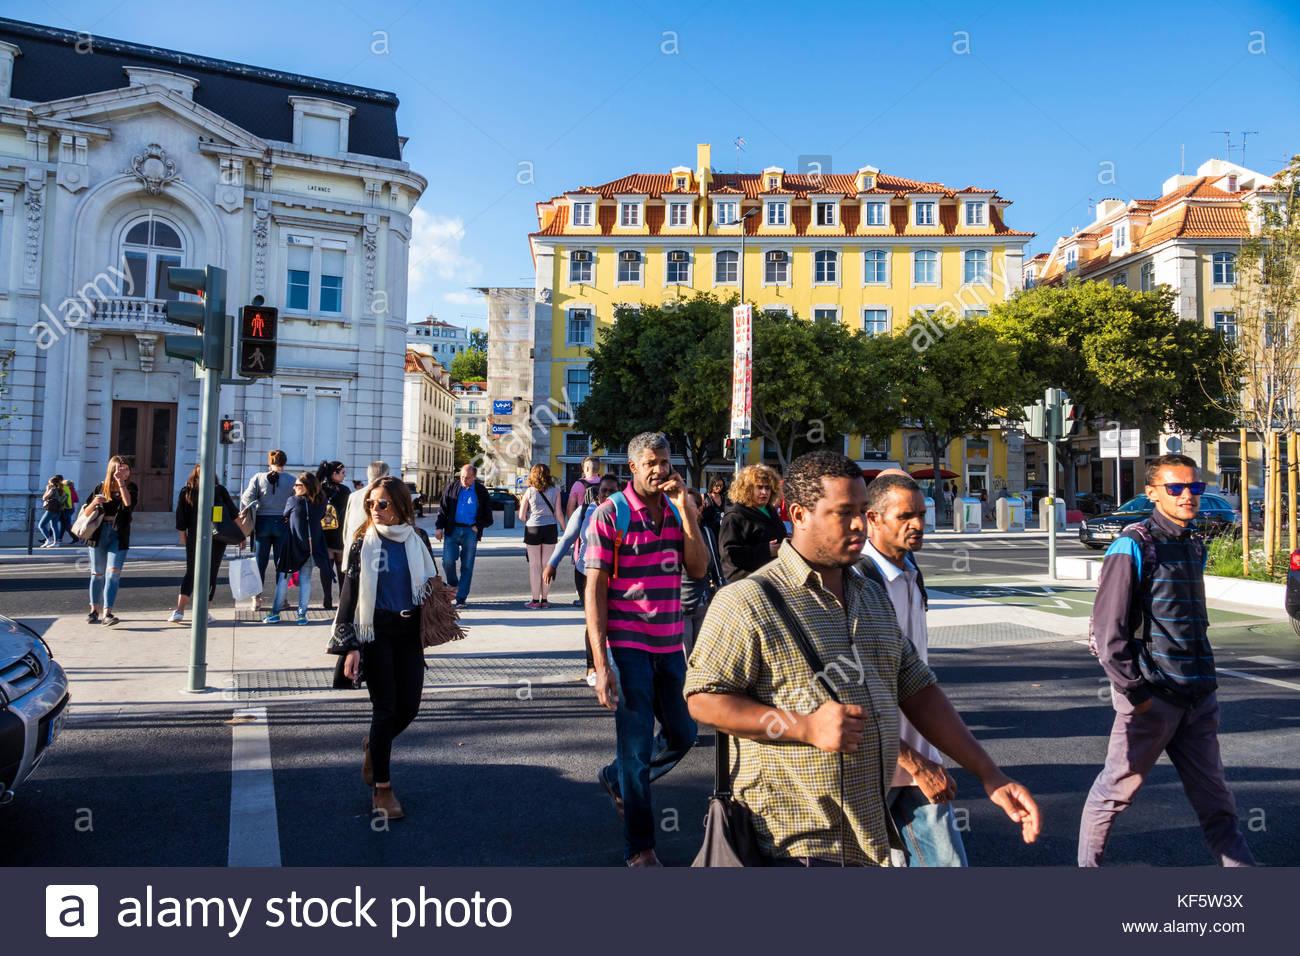 Lisbon Portugal Cais do Sodre street crossing pedestrian Black man woman residential apartment buildings - Stock Image